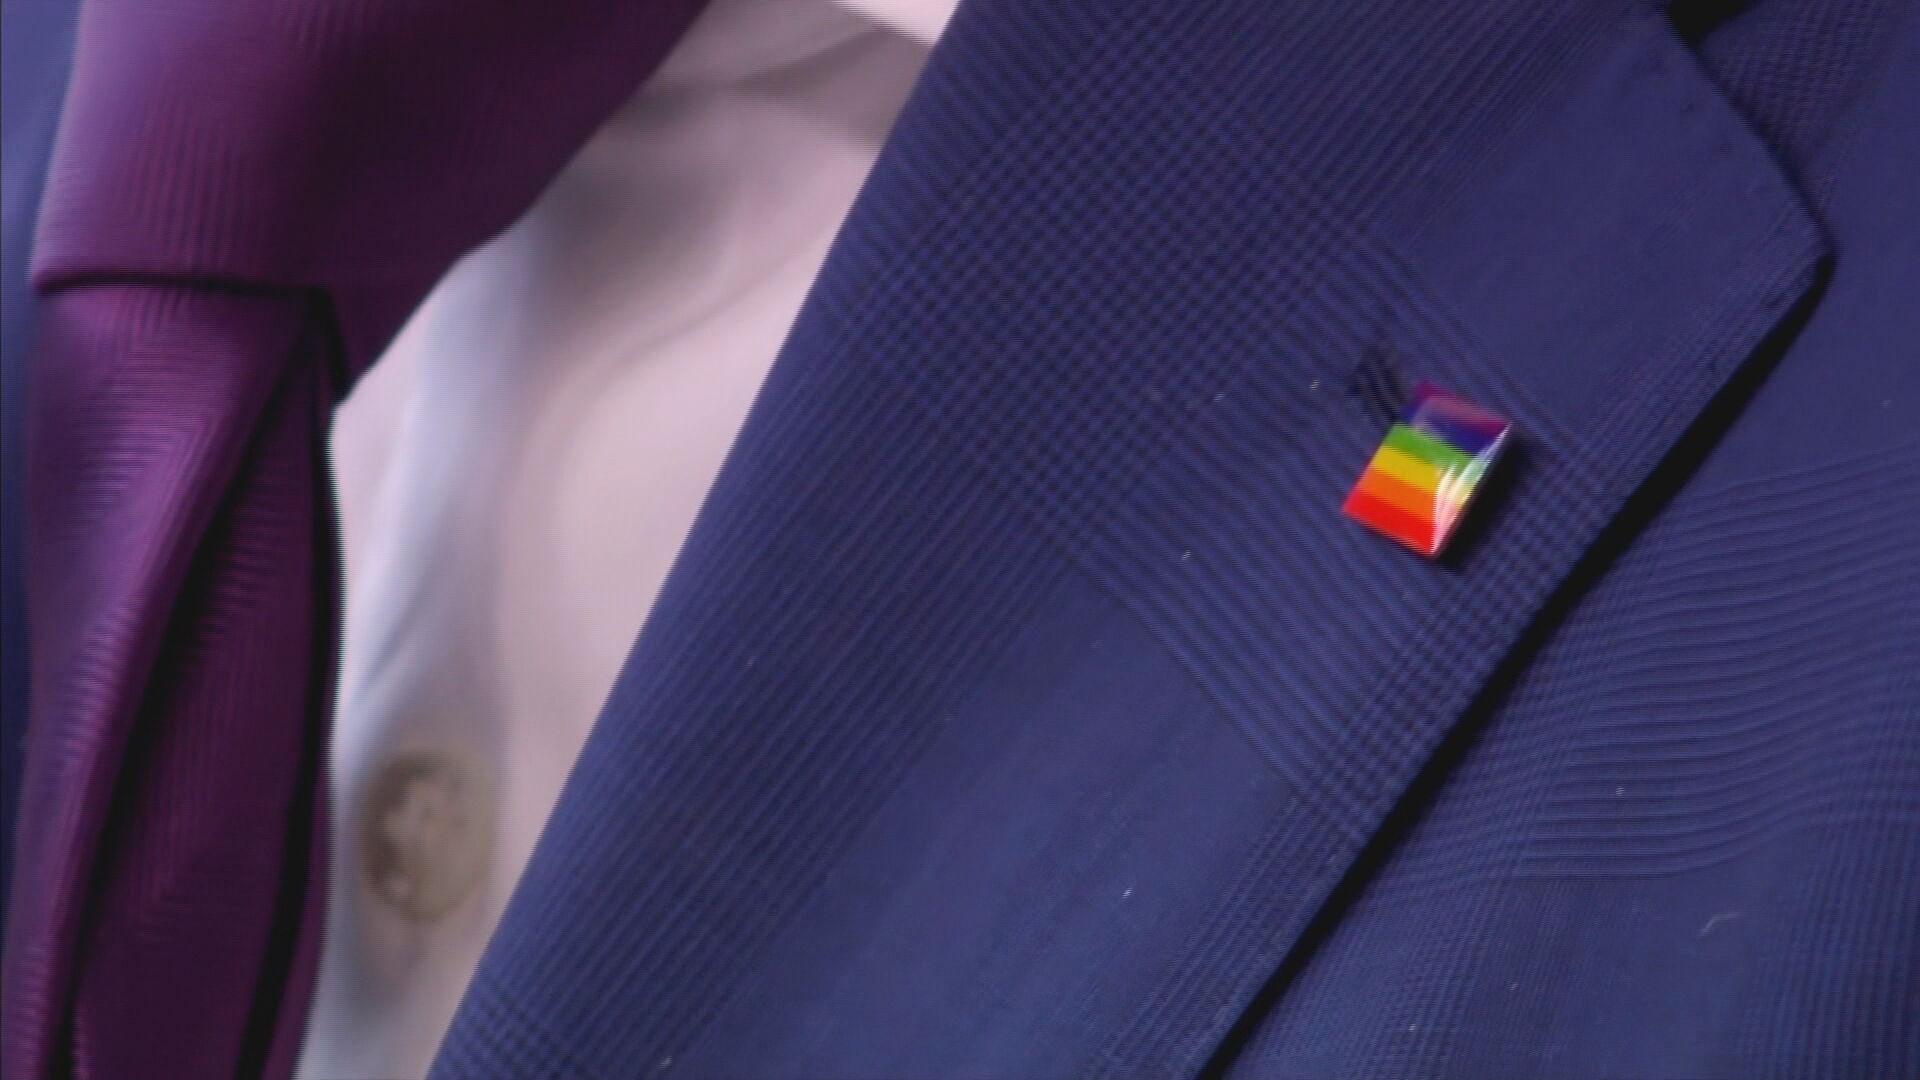 Líderes da UE criticaram lei húngara anti-LGBTQIA+